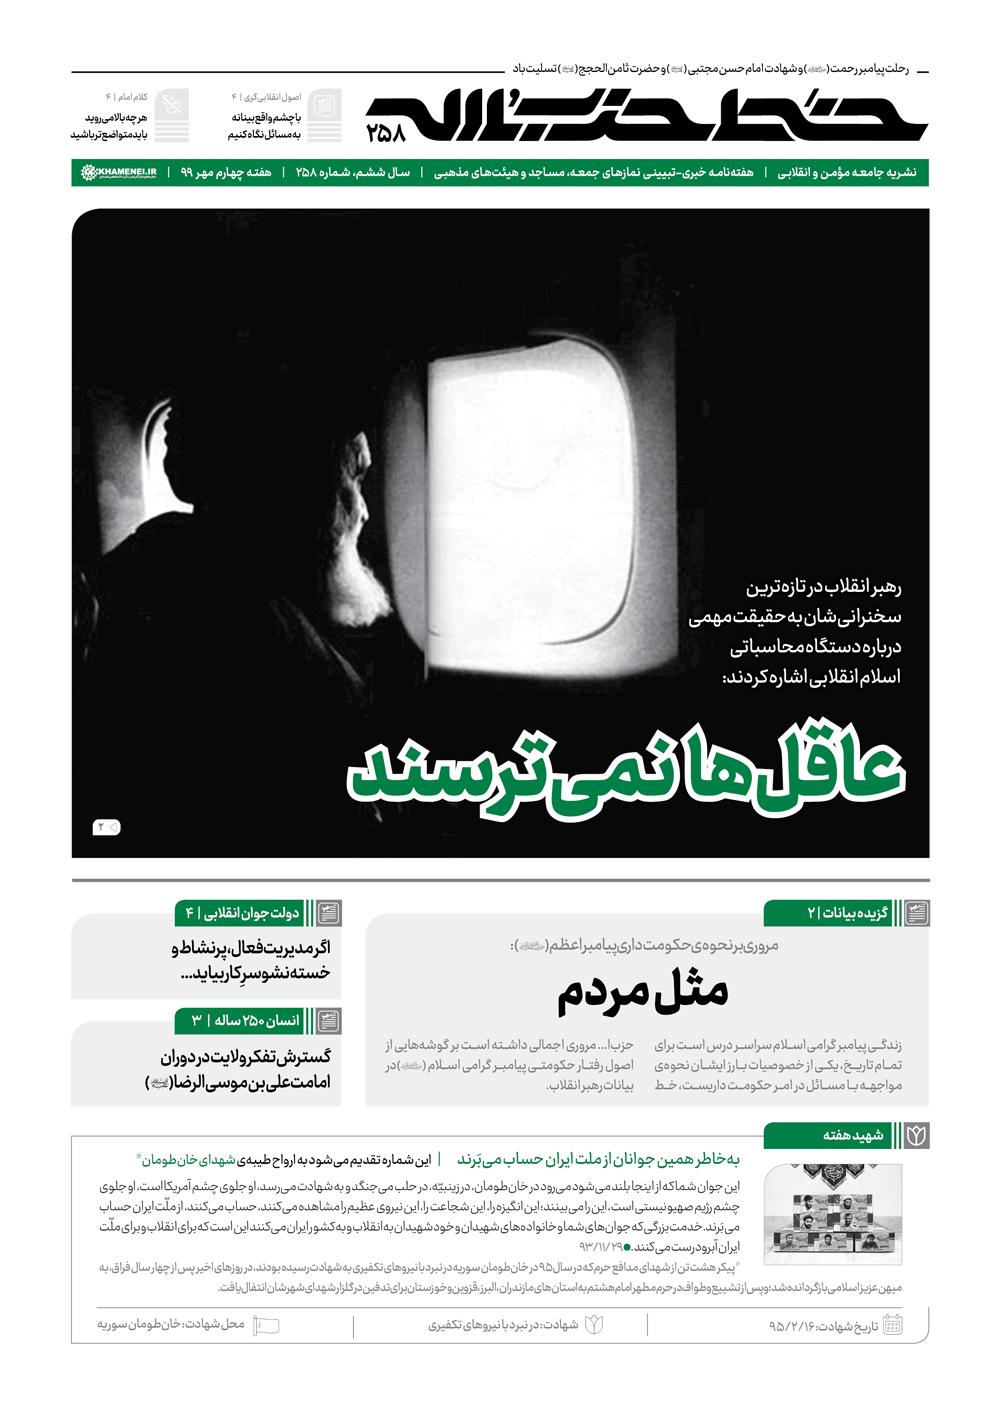 13990724000270 Test NewPhotoFree - خط حزبالله | عاقلها نمیترسند